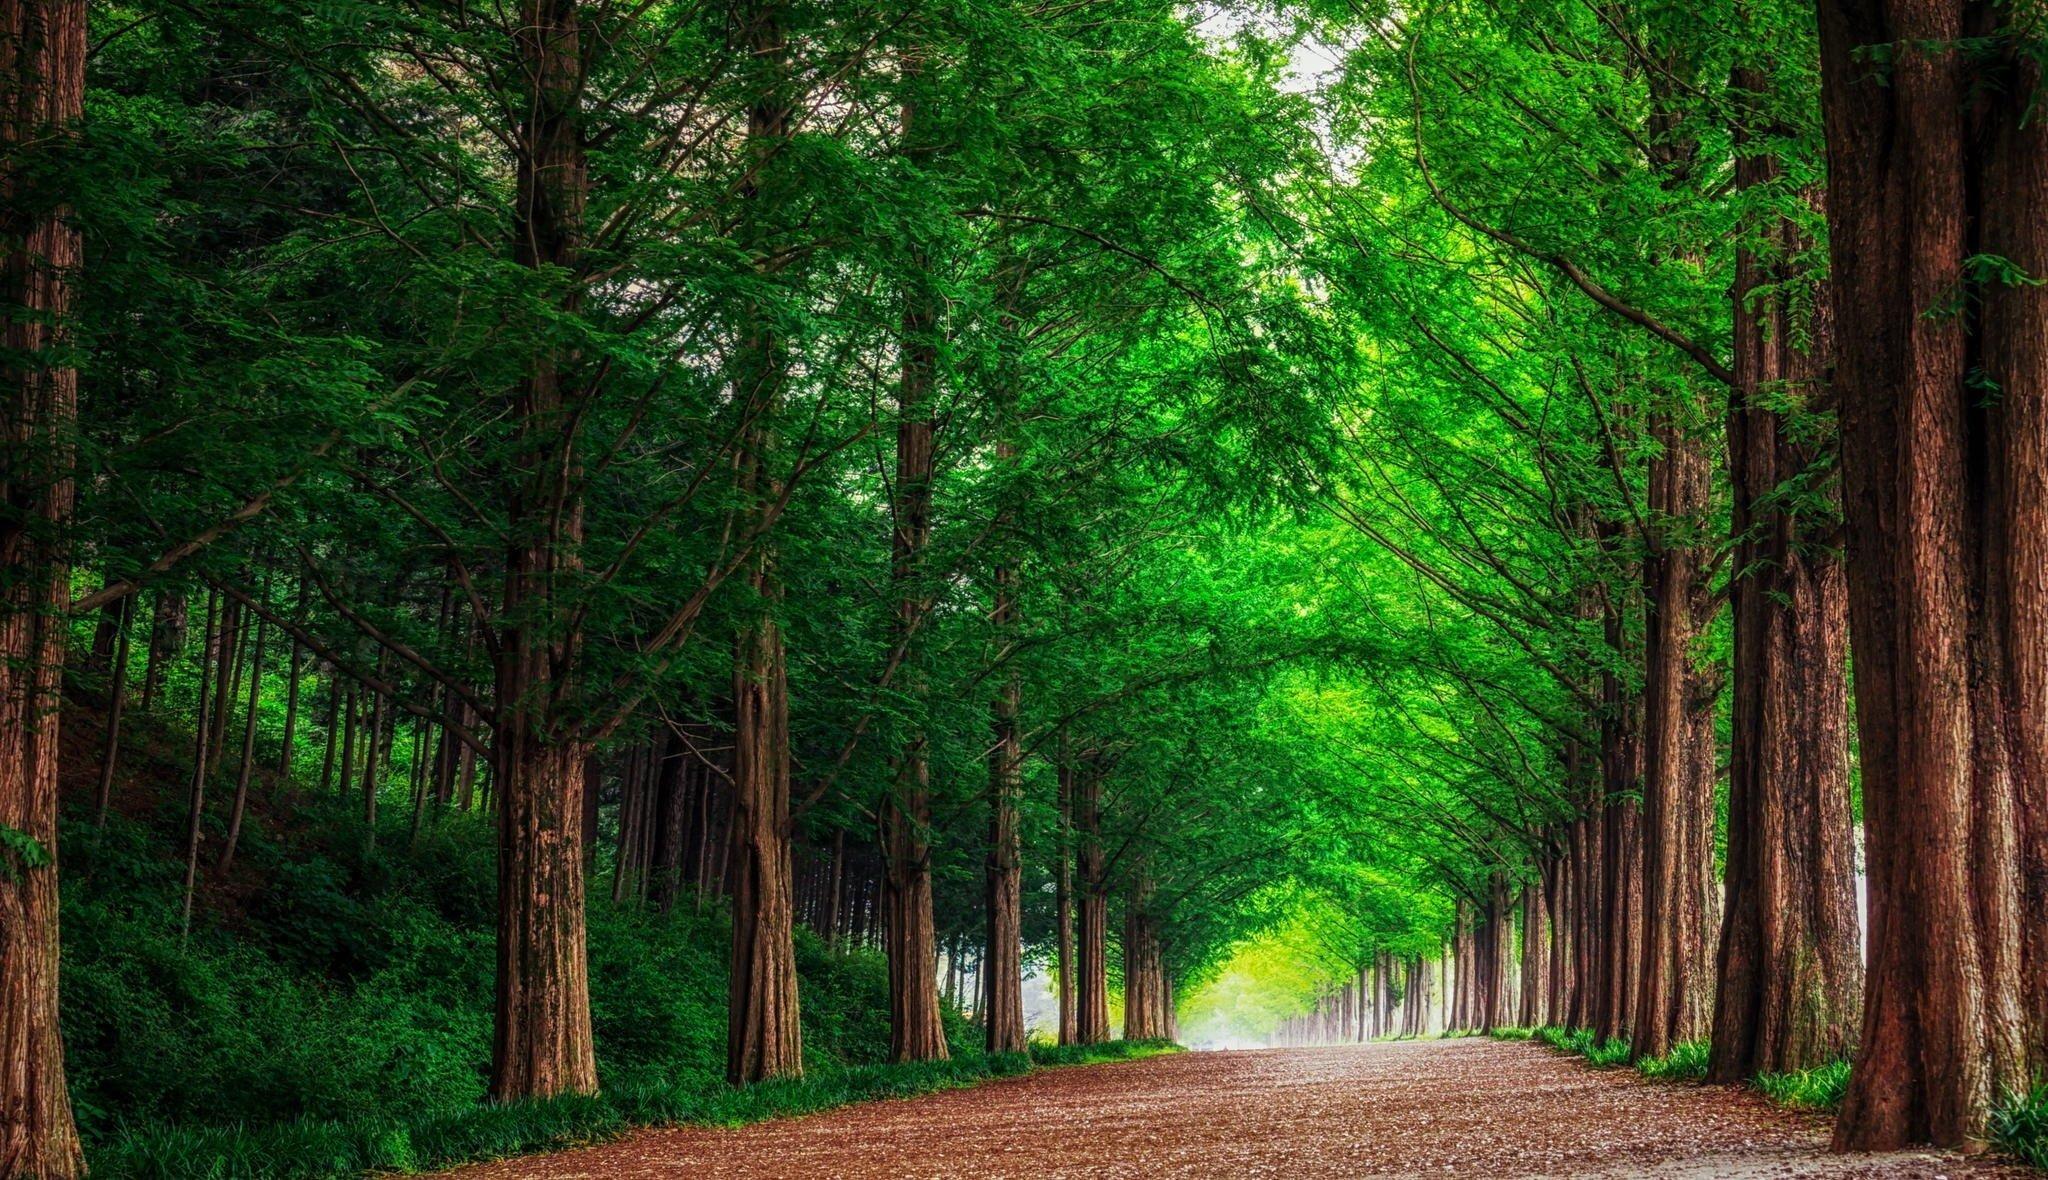 v-lesu-na-prirode-foto-zrelih-berushih